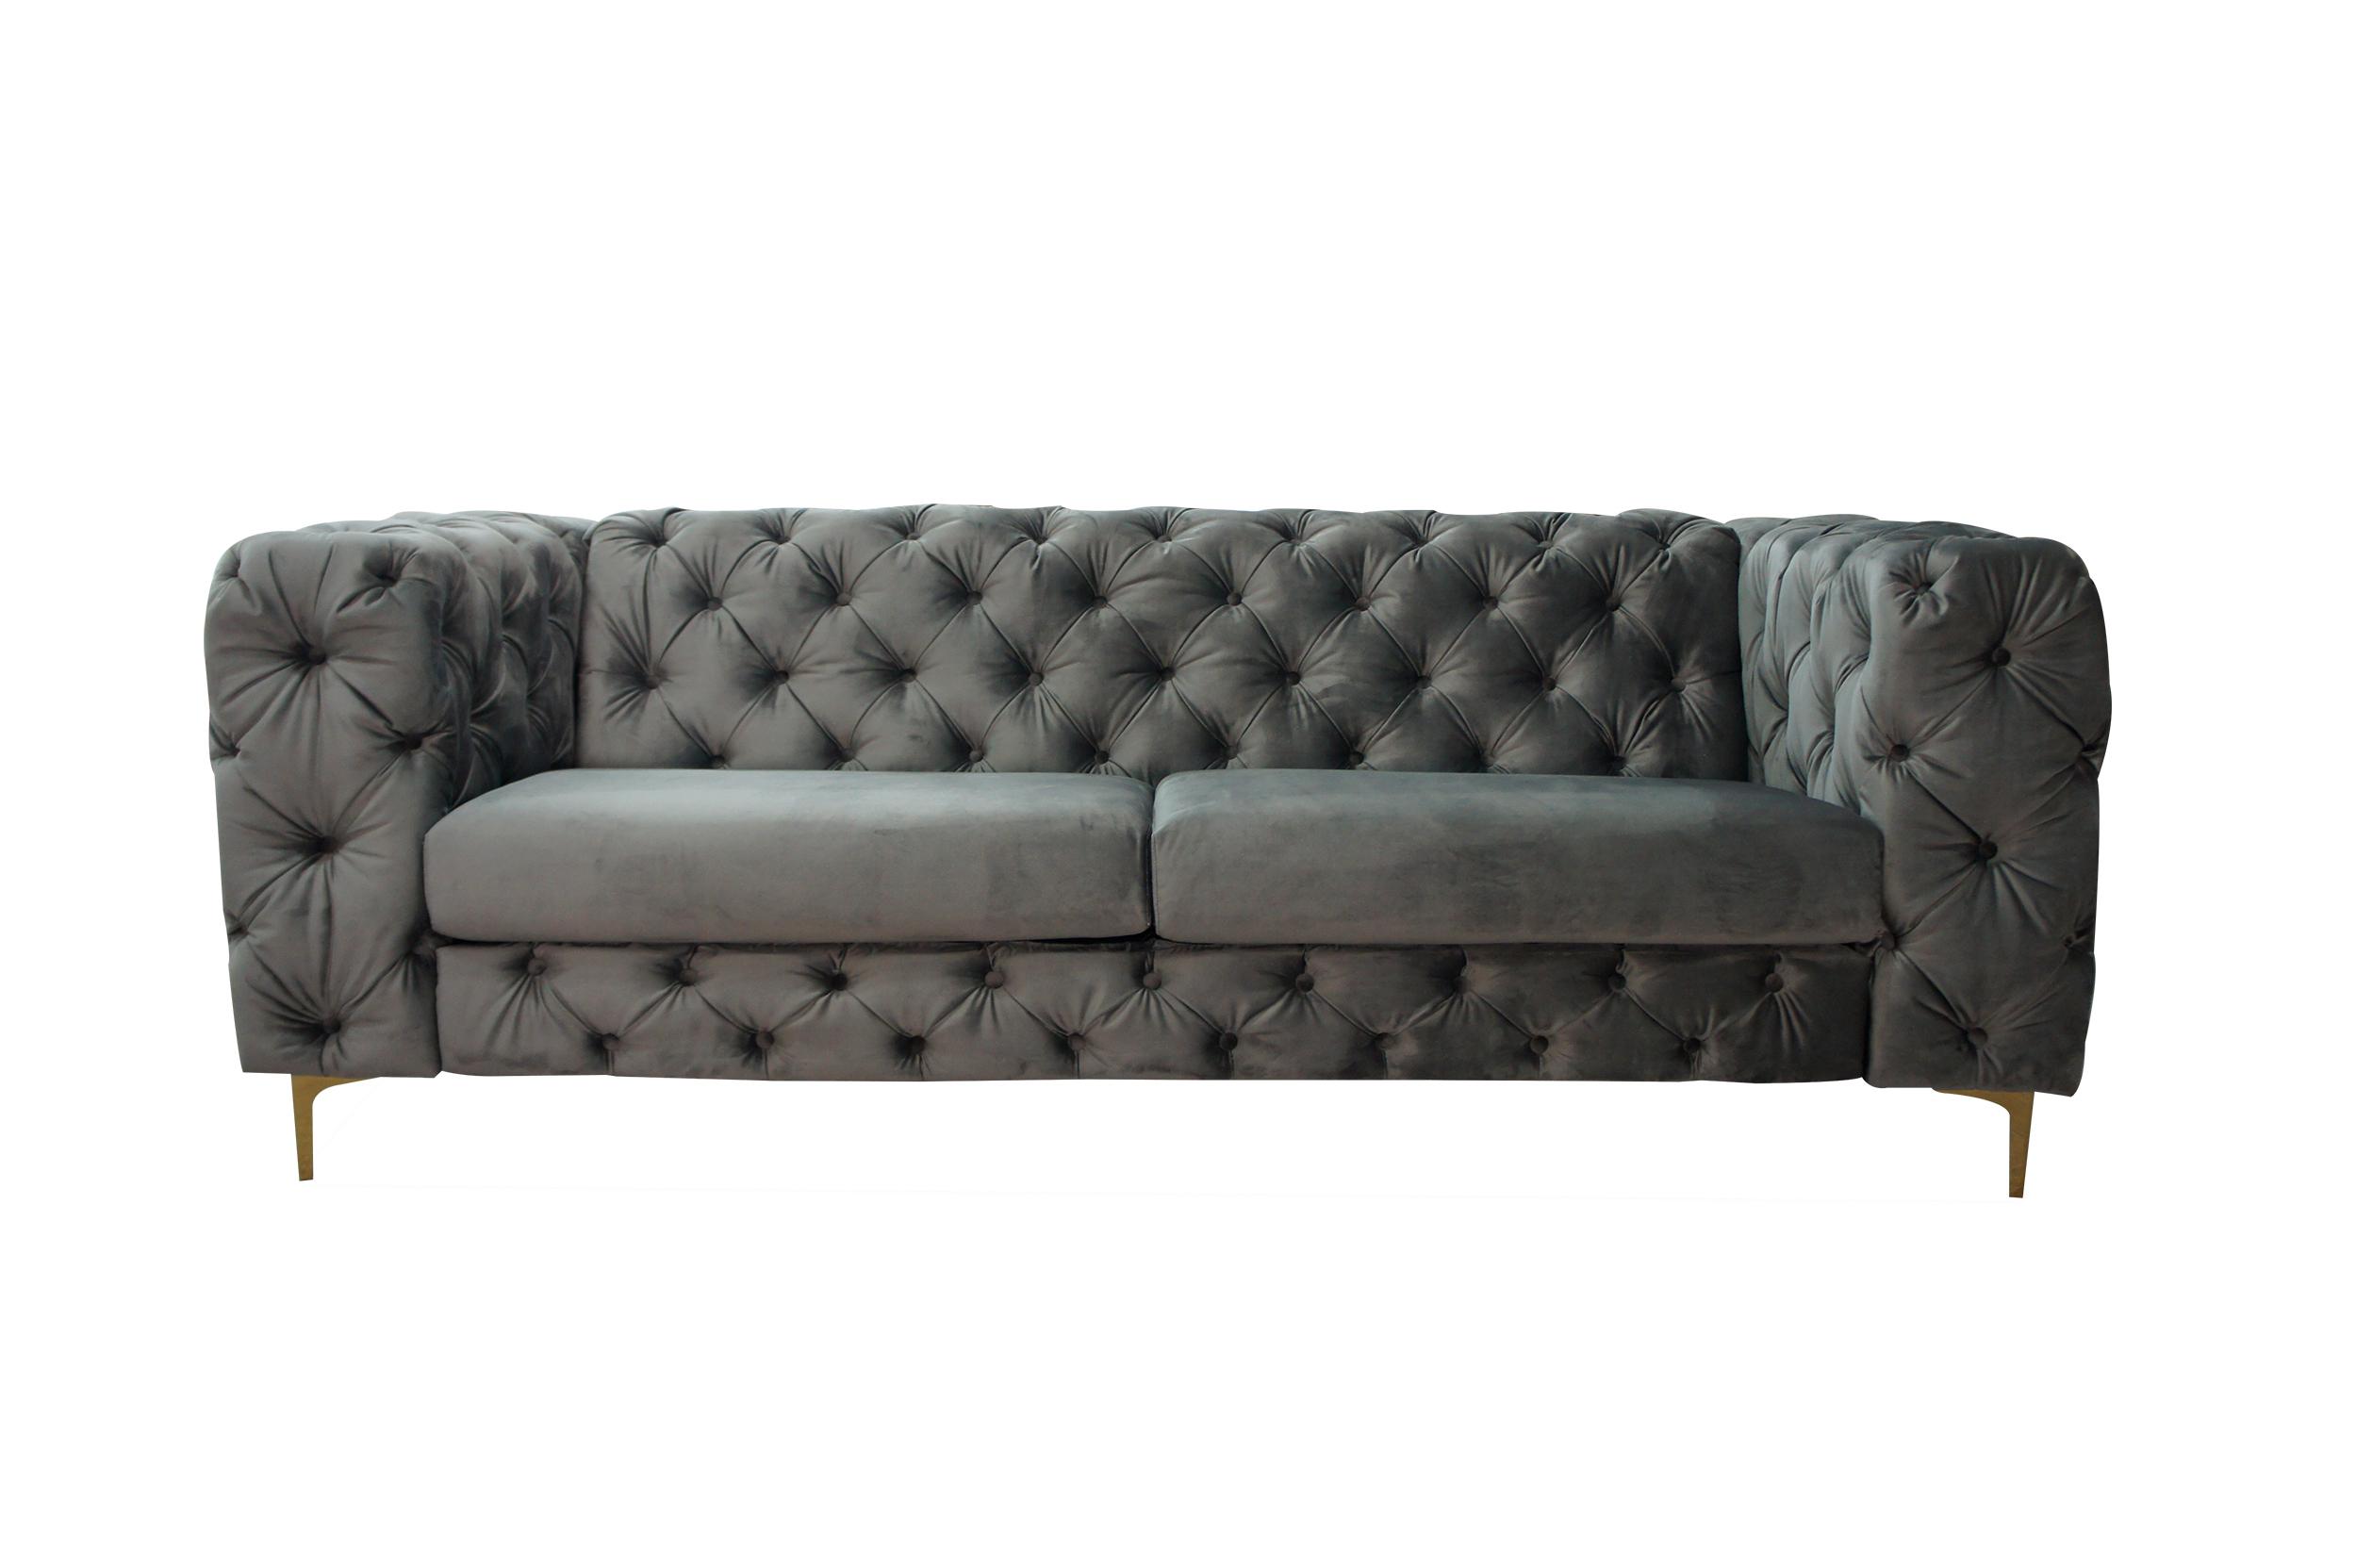 Full Size of 3er Sofa Grau Lc Home Dreisitzer Couch Kingdom Chesterfield Samt Barock Creme De Sede Für Esszimmer Schlaf Affaire 3 Sitzer Mit Relaxfunktion Kolonialstil Sofa 3er Sofa Grau